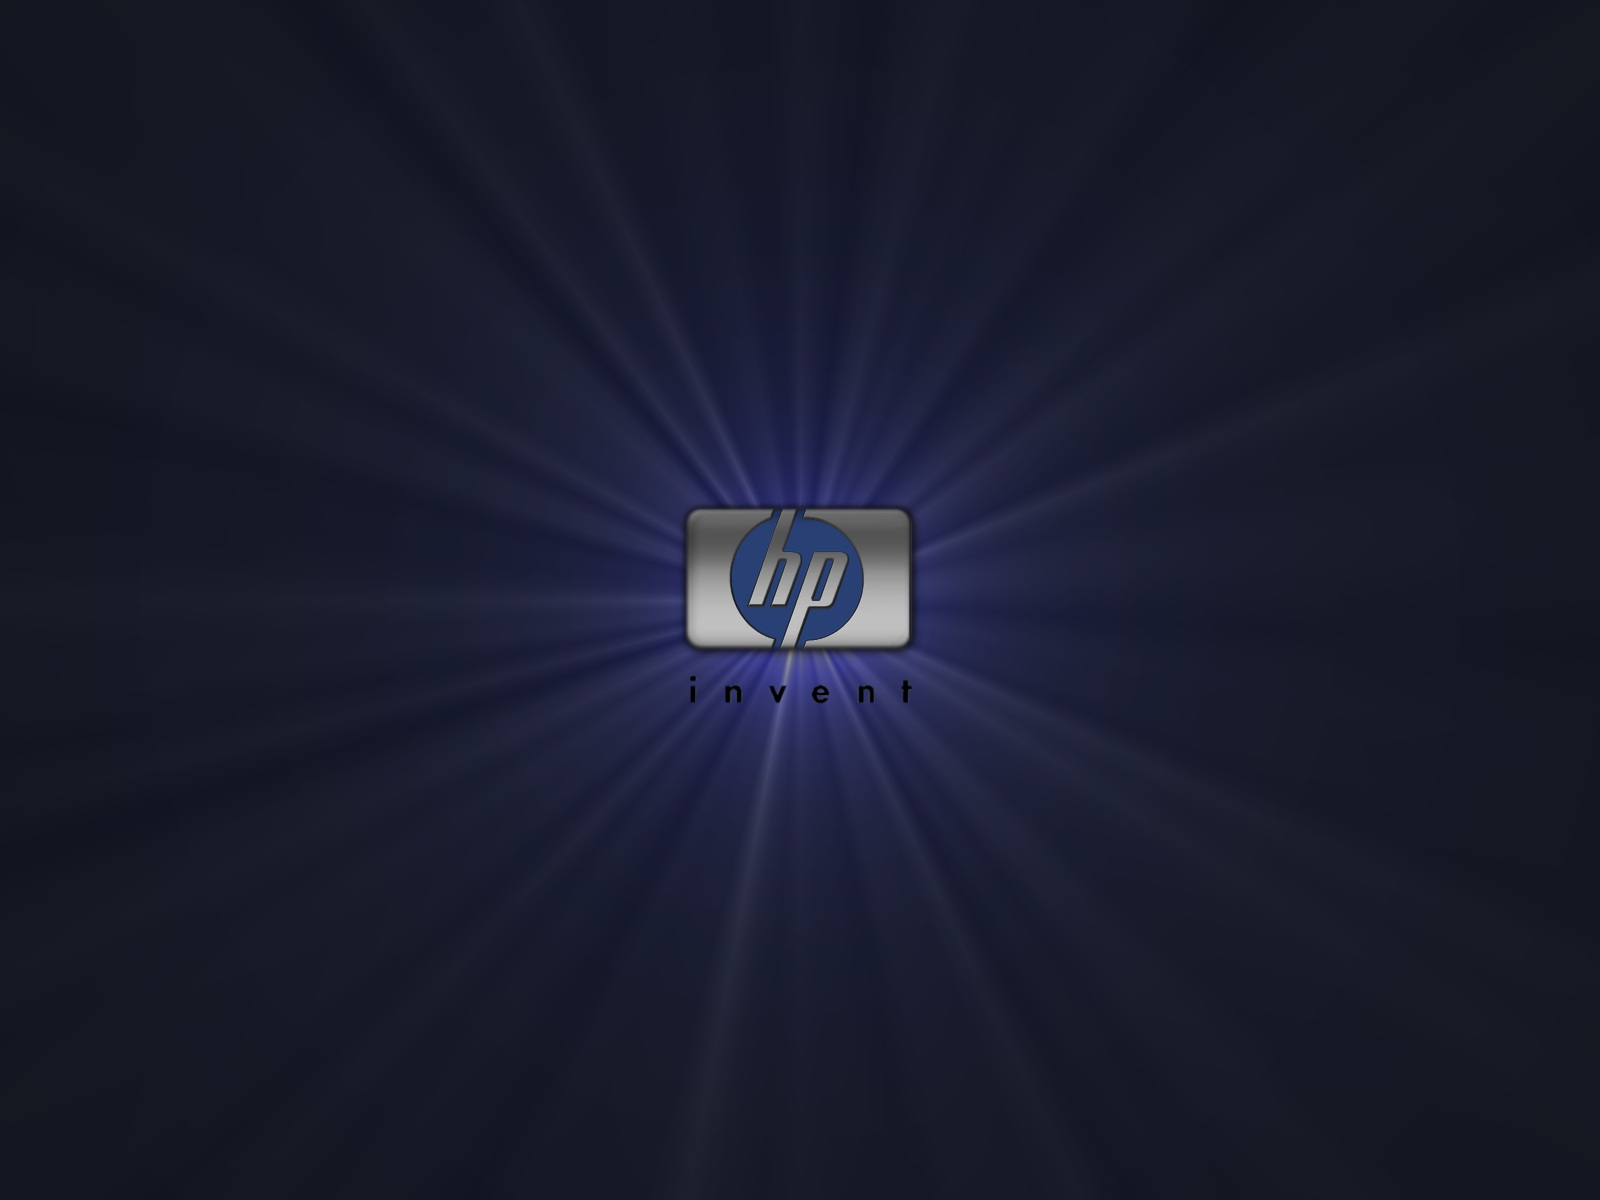 http://4.bp.blogspot.com/-iuFC-1ENoPc/UKszDZjnRbI/AAAAAAAAAhI/2tZHdOp4k_I/s1600/hp-laptop-wallpaper-16.jpg